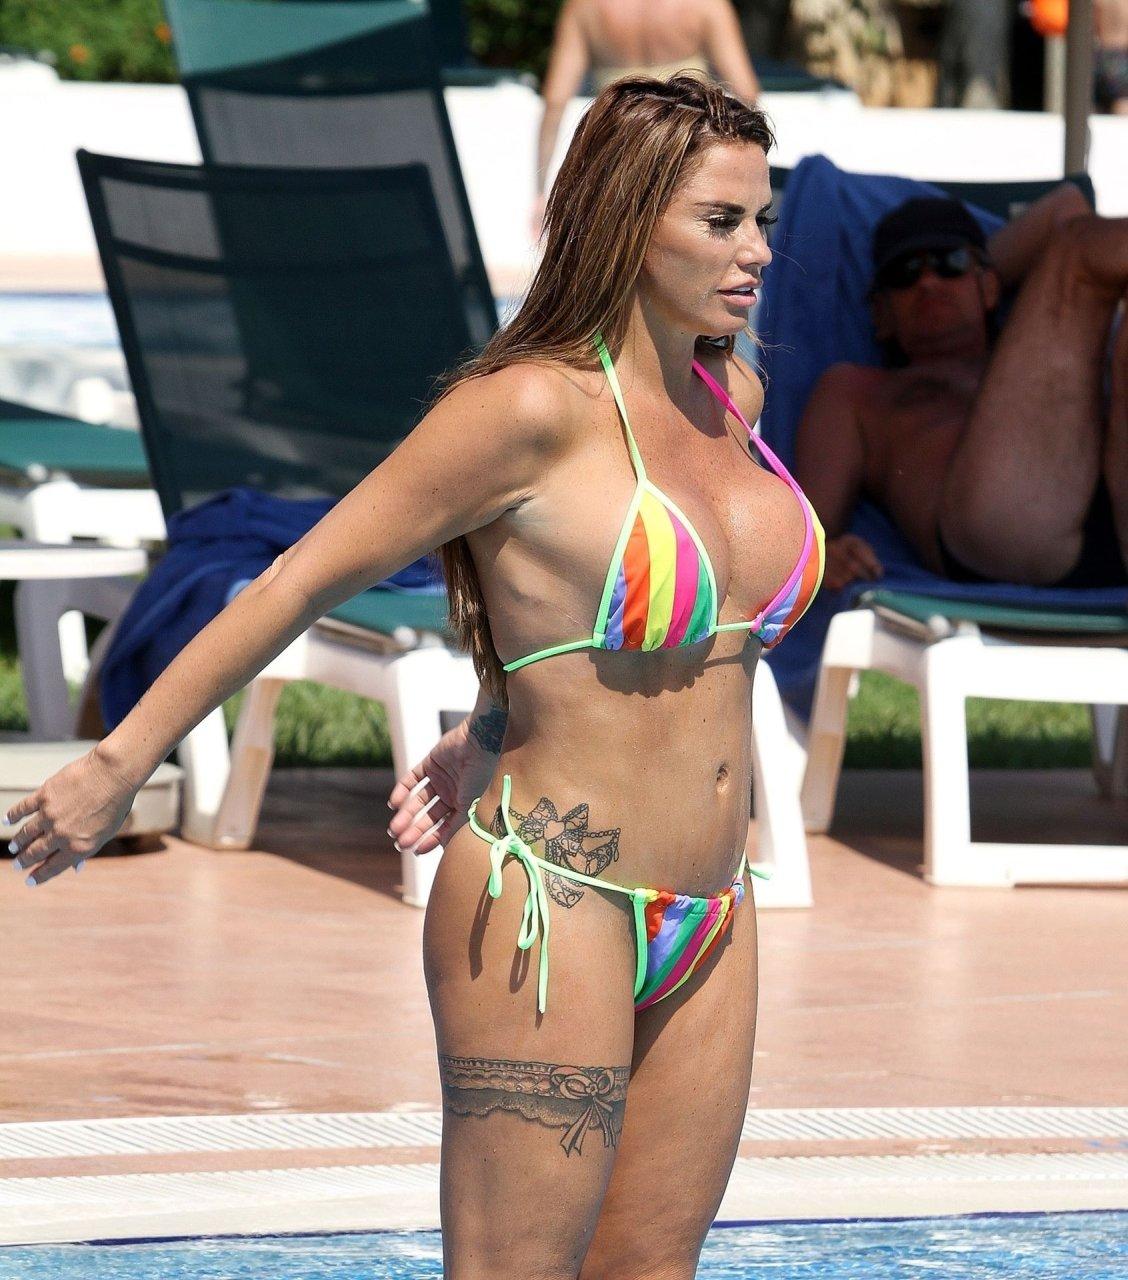 Katie-Price-Nude-Sexy-TheFappeningBlog.com-20.jpg